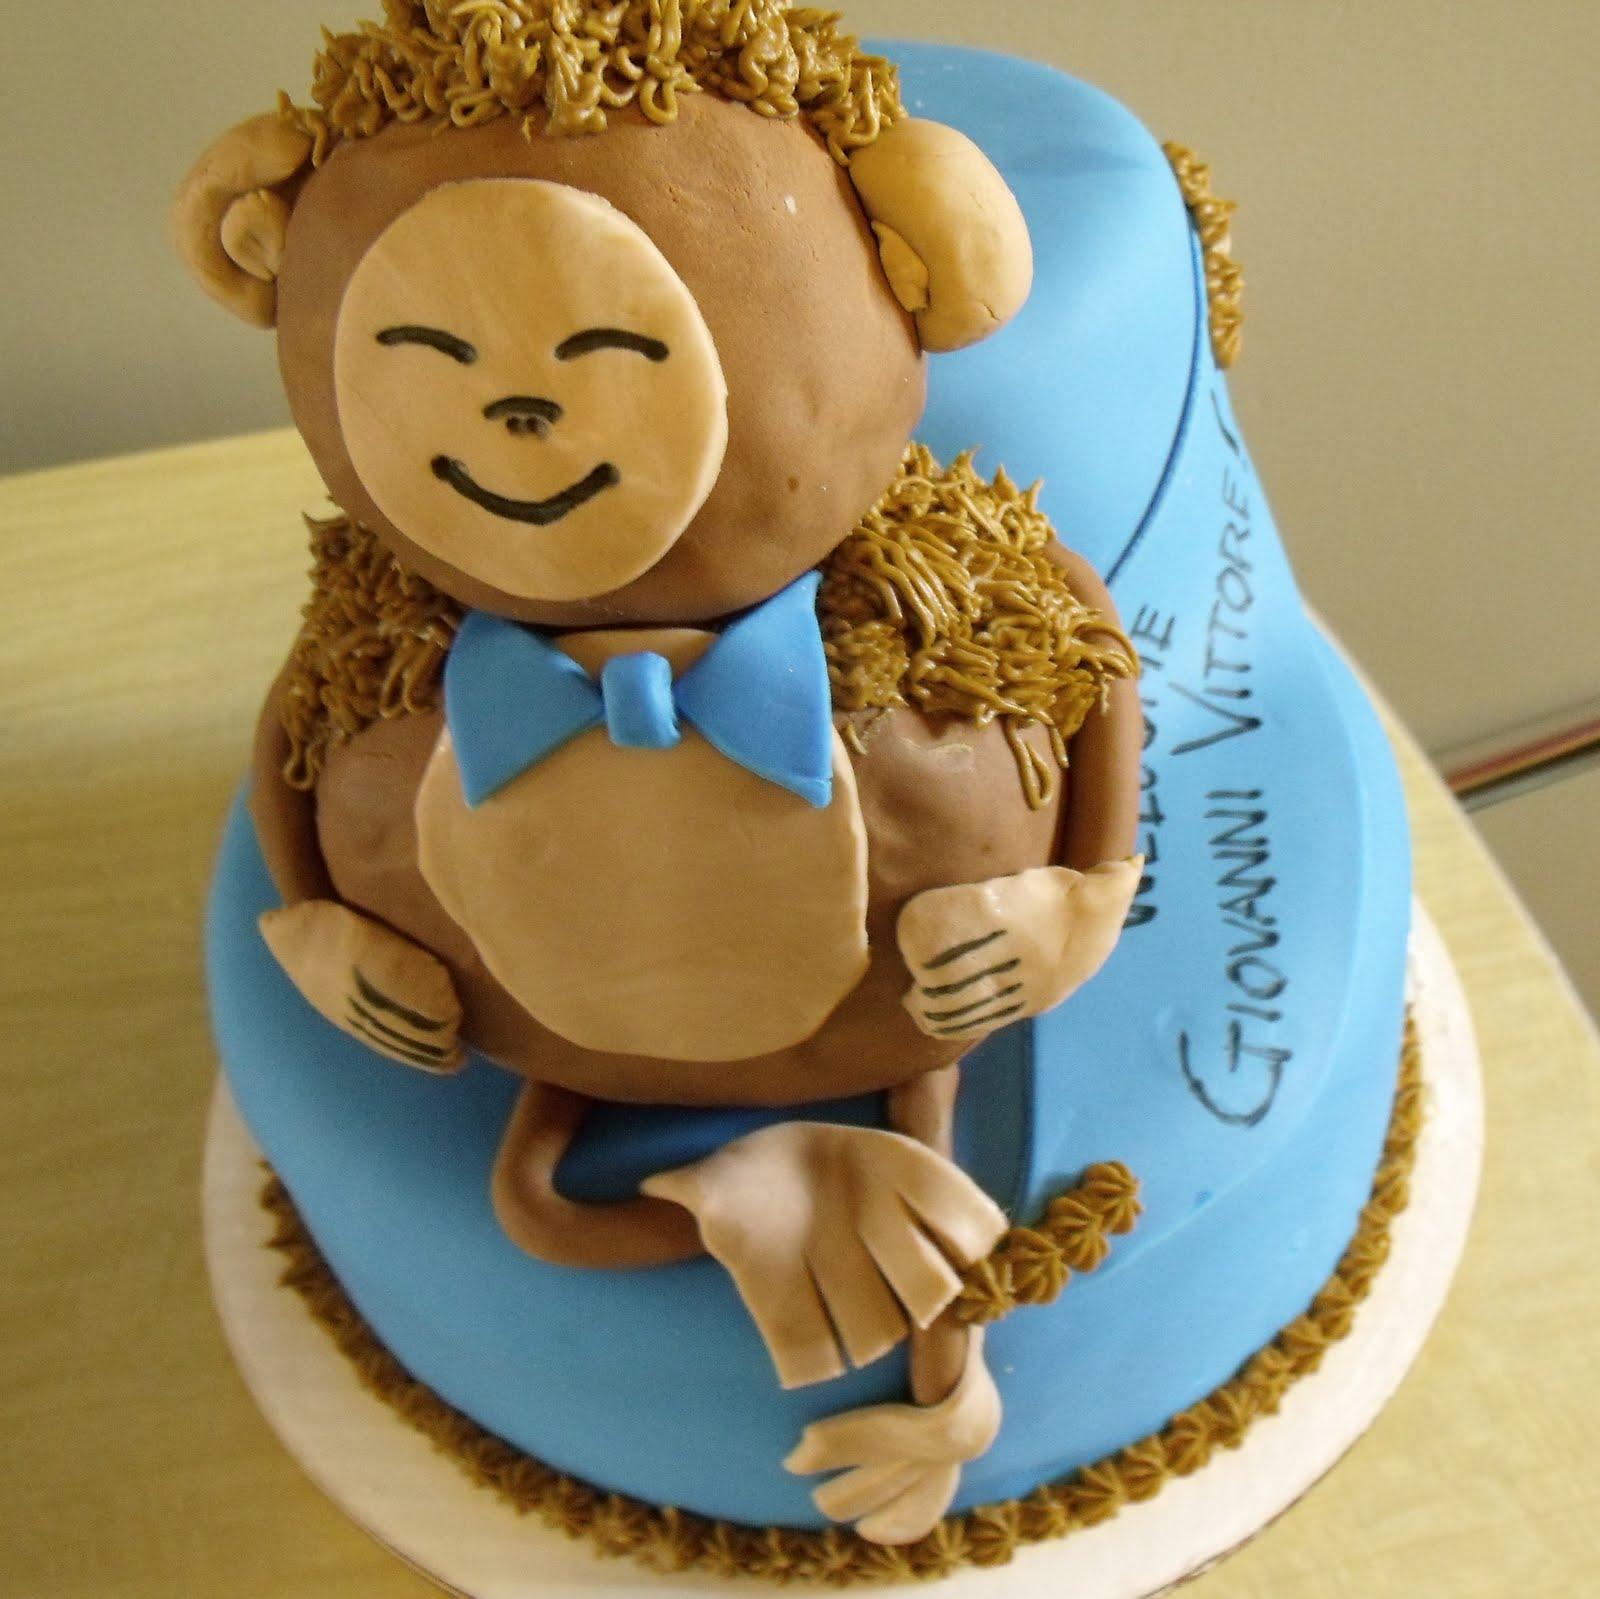 Cup Adelphia Monkey Cake For Baby Shower